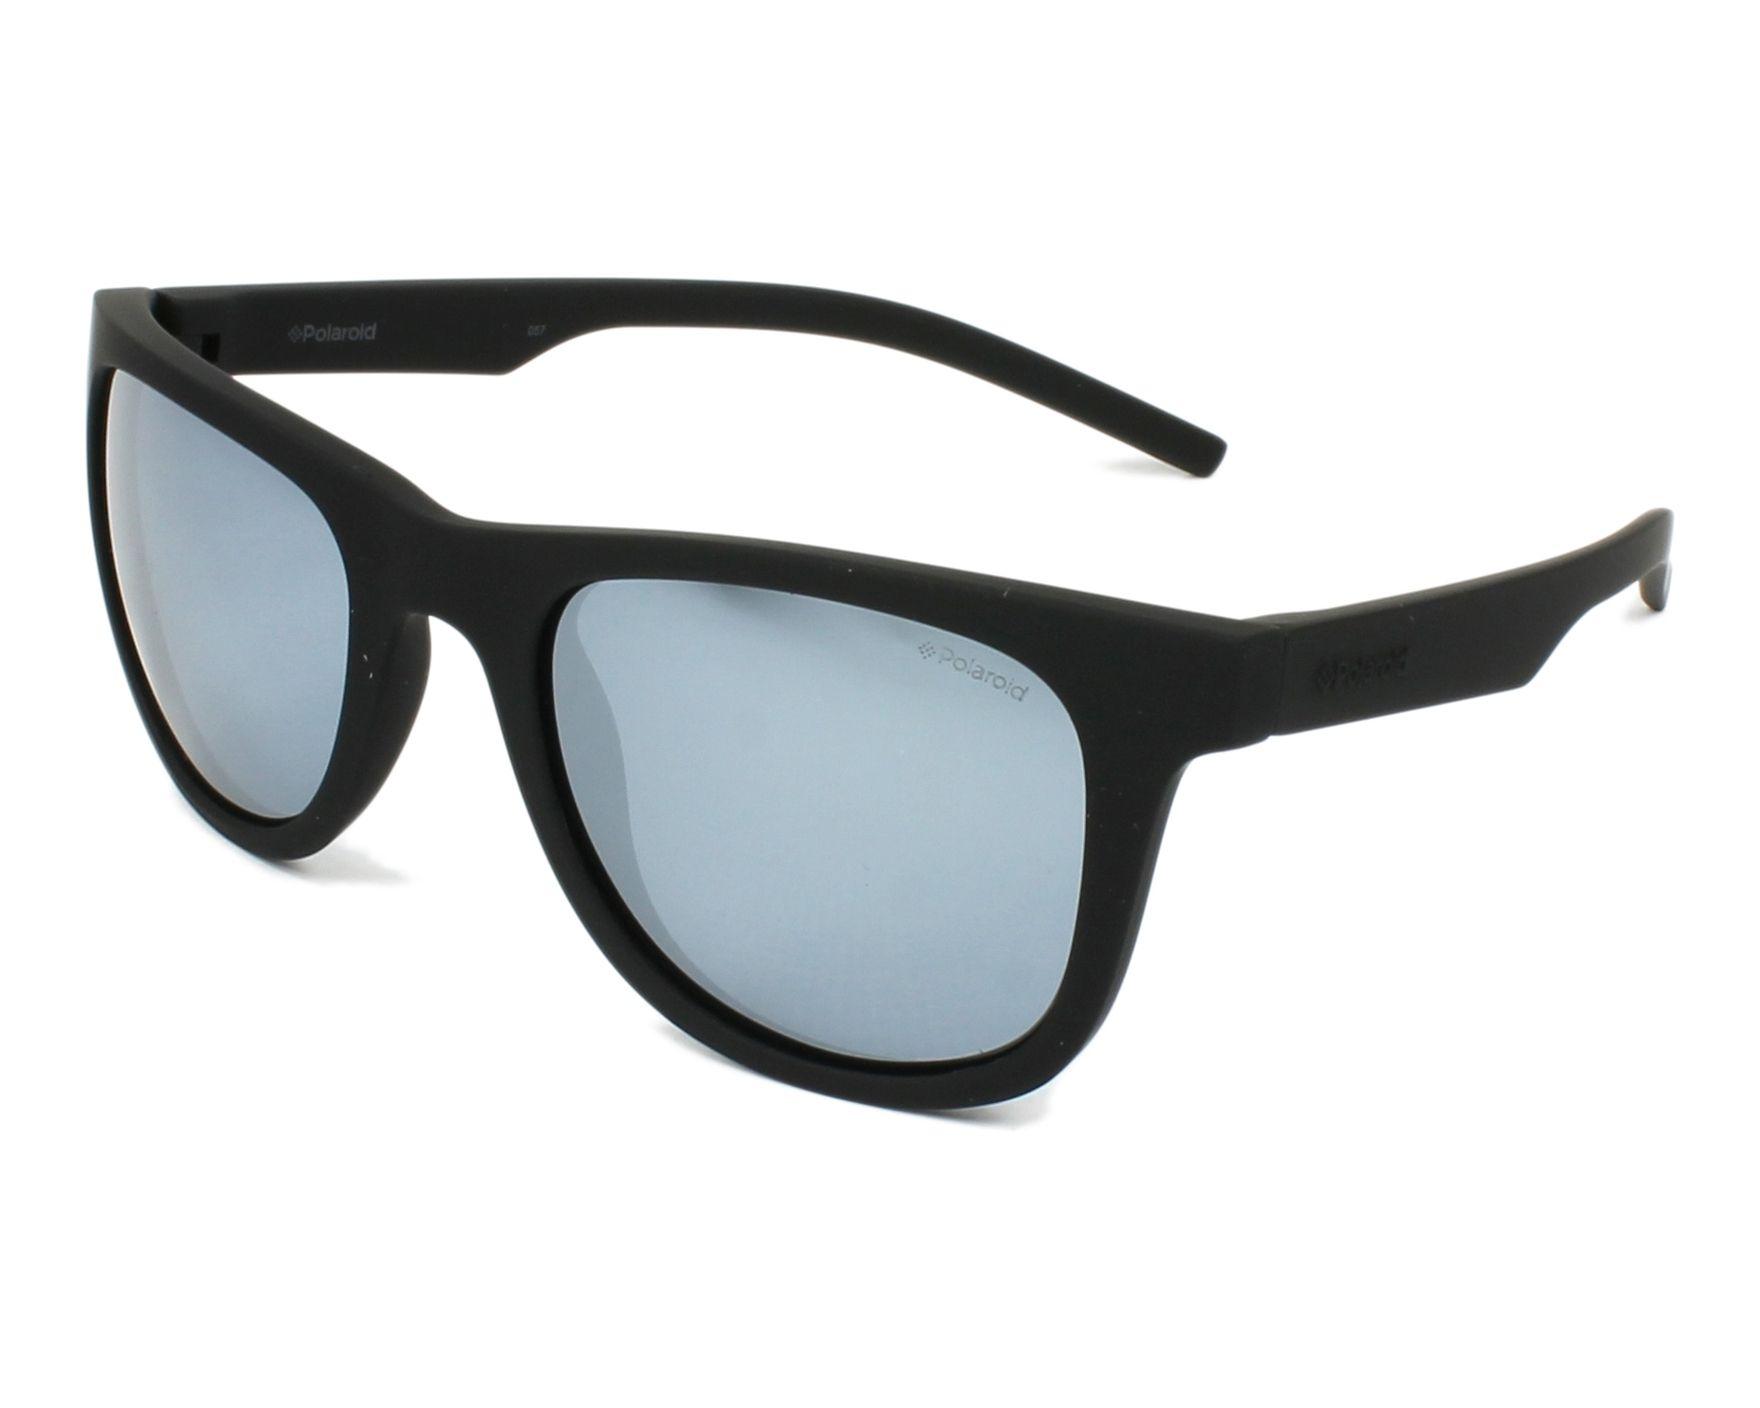 Polaroid Sunglasses Pld 7020 S 807 Ex Black Visionet